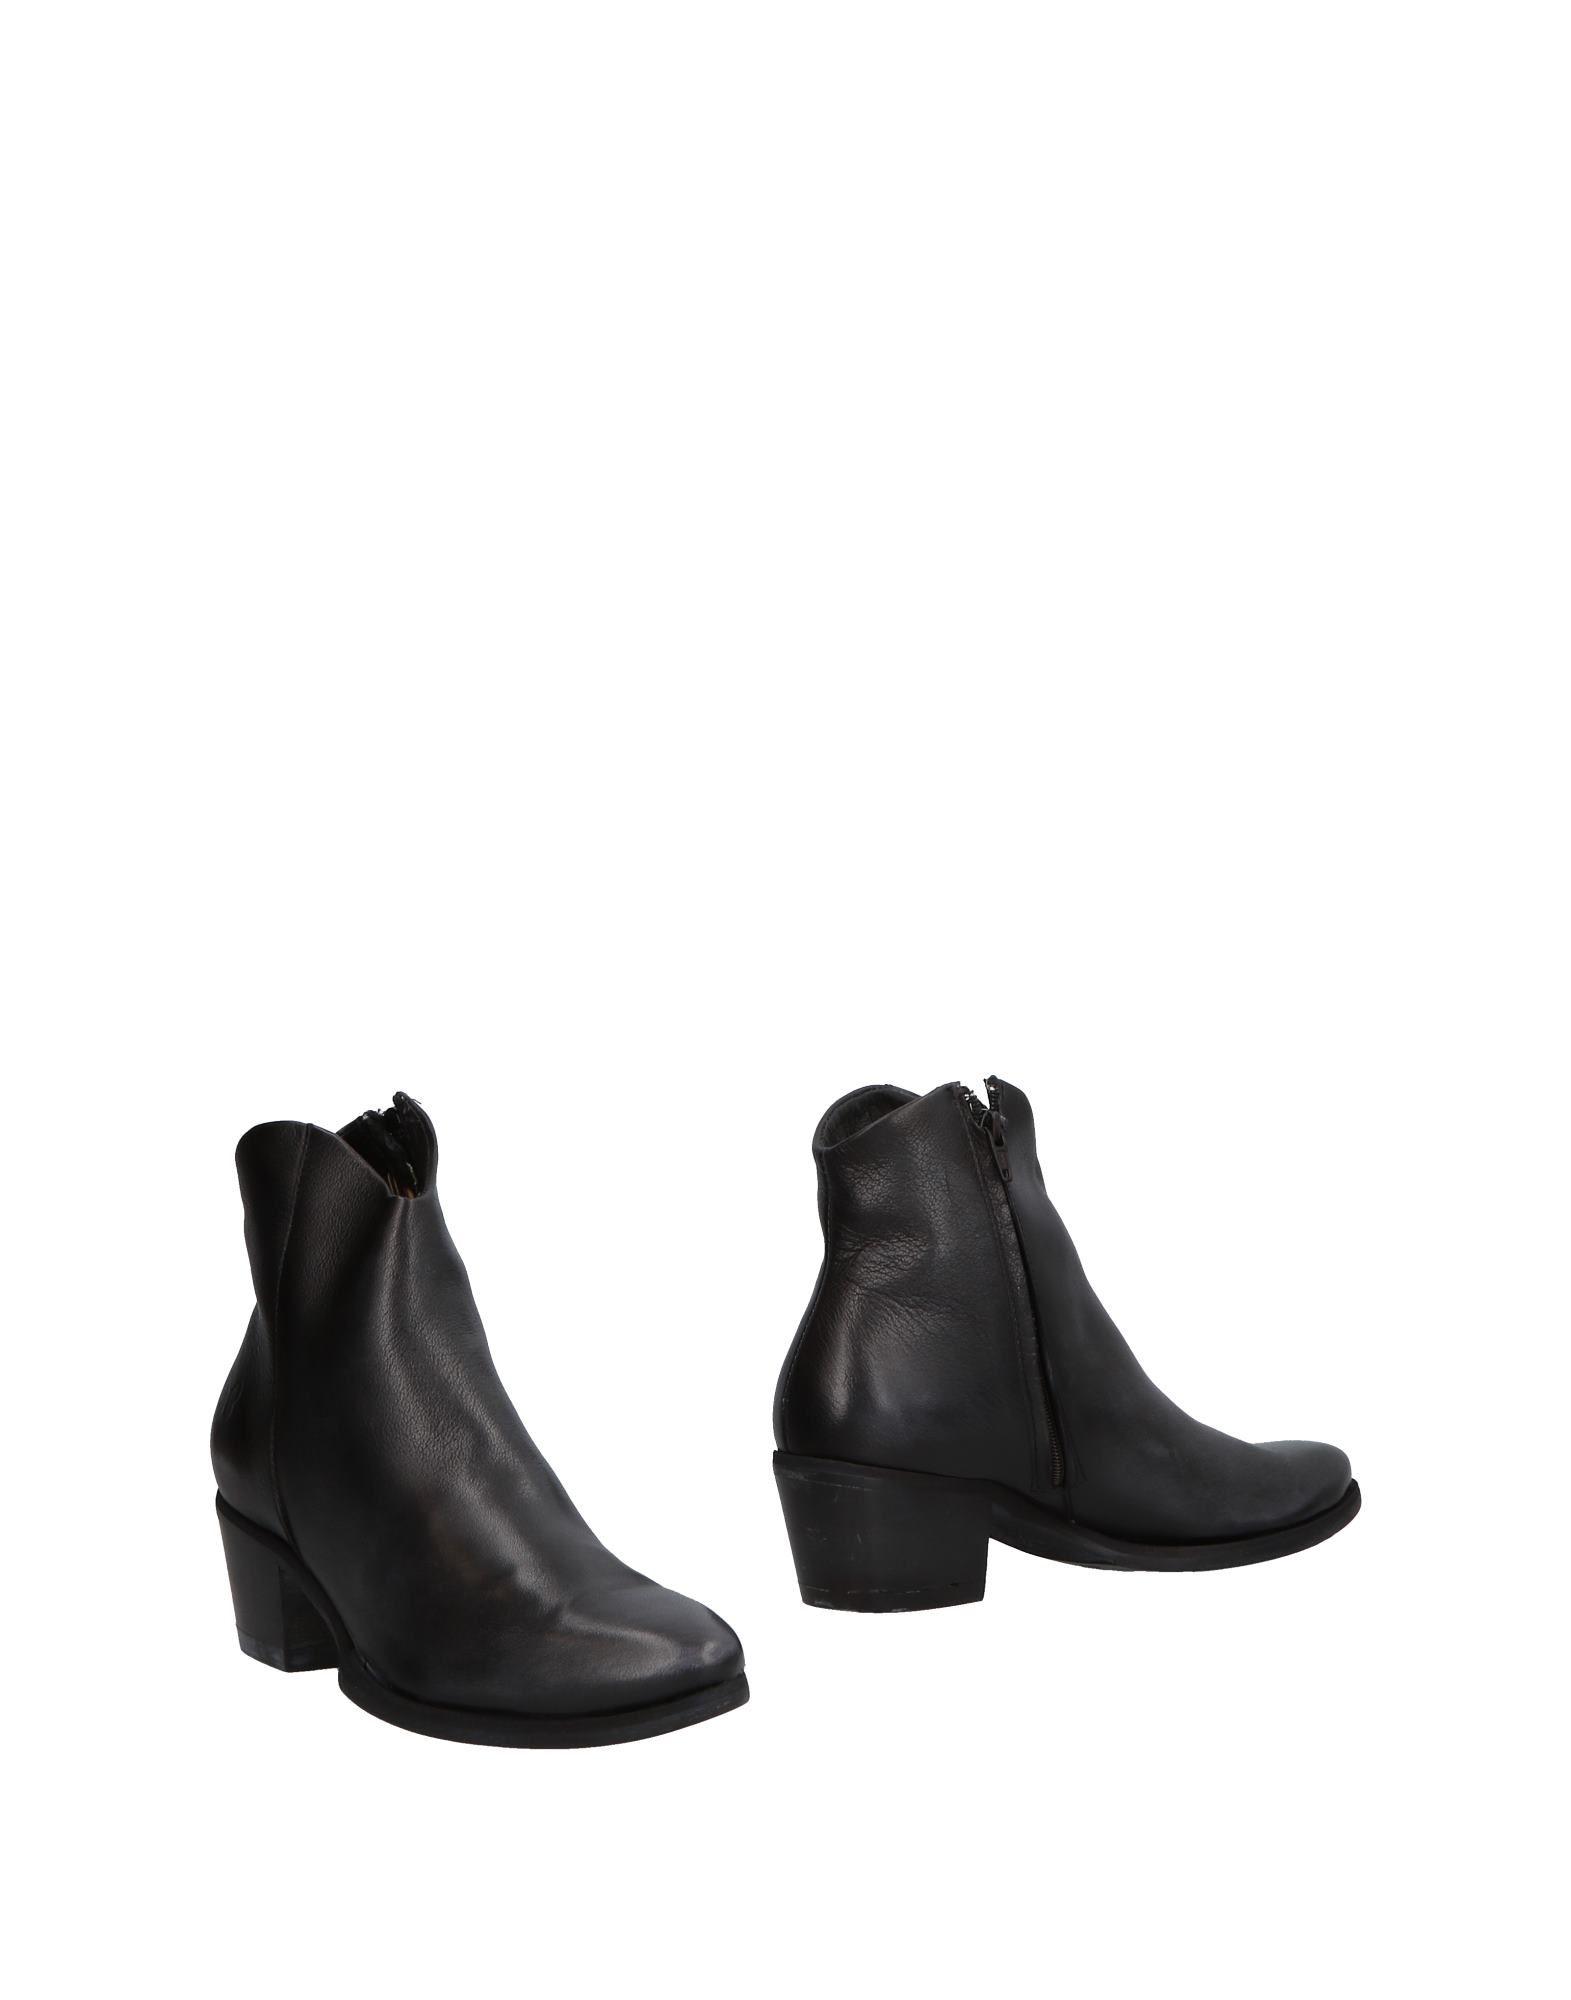 Felmini Stiefelette Damen  11505626XT Gute Qualität beliebte Schuhe